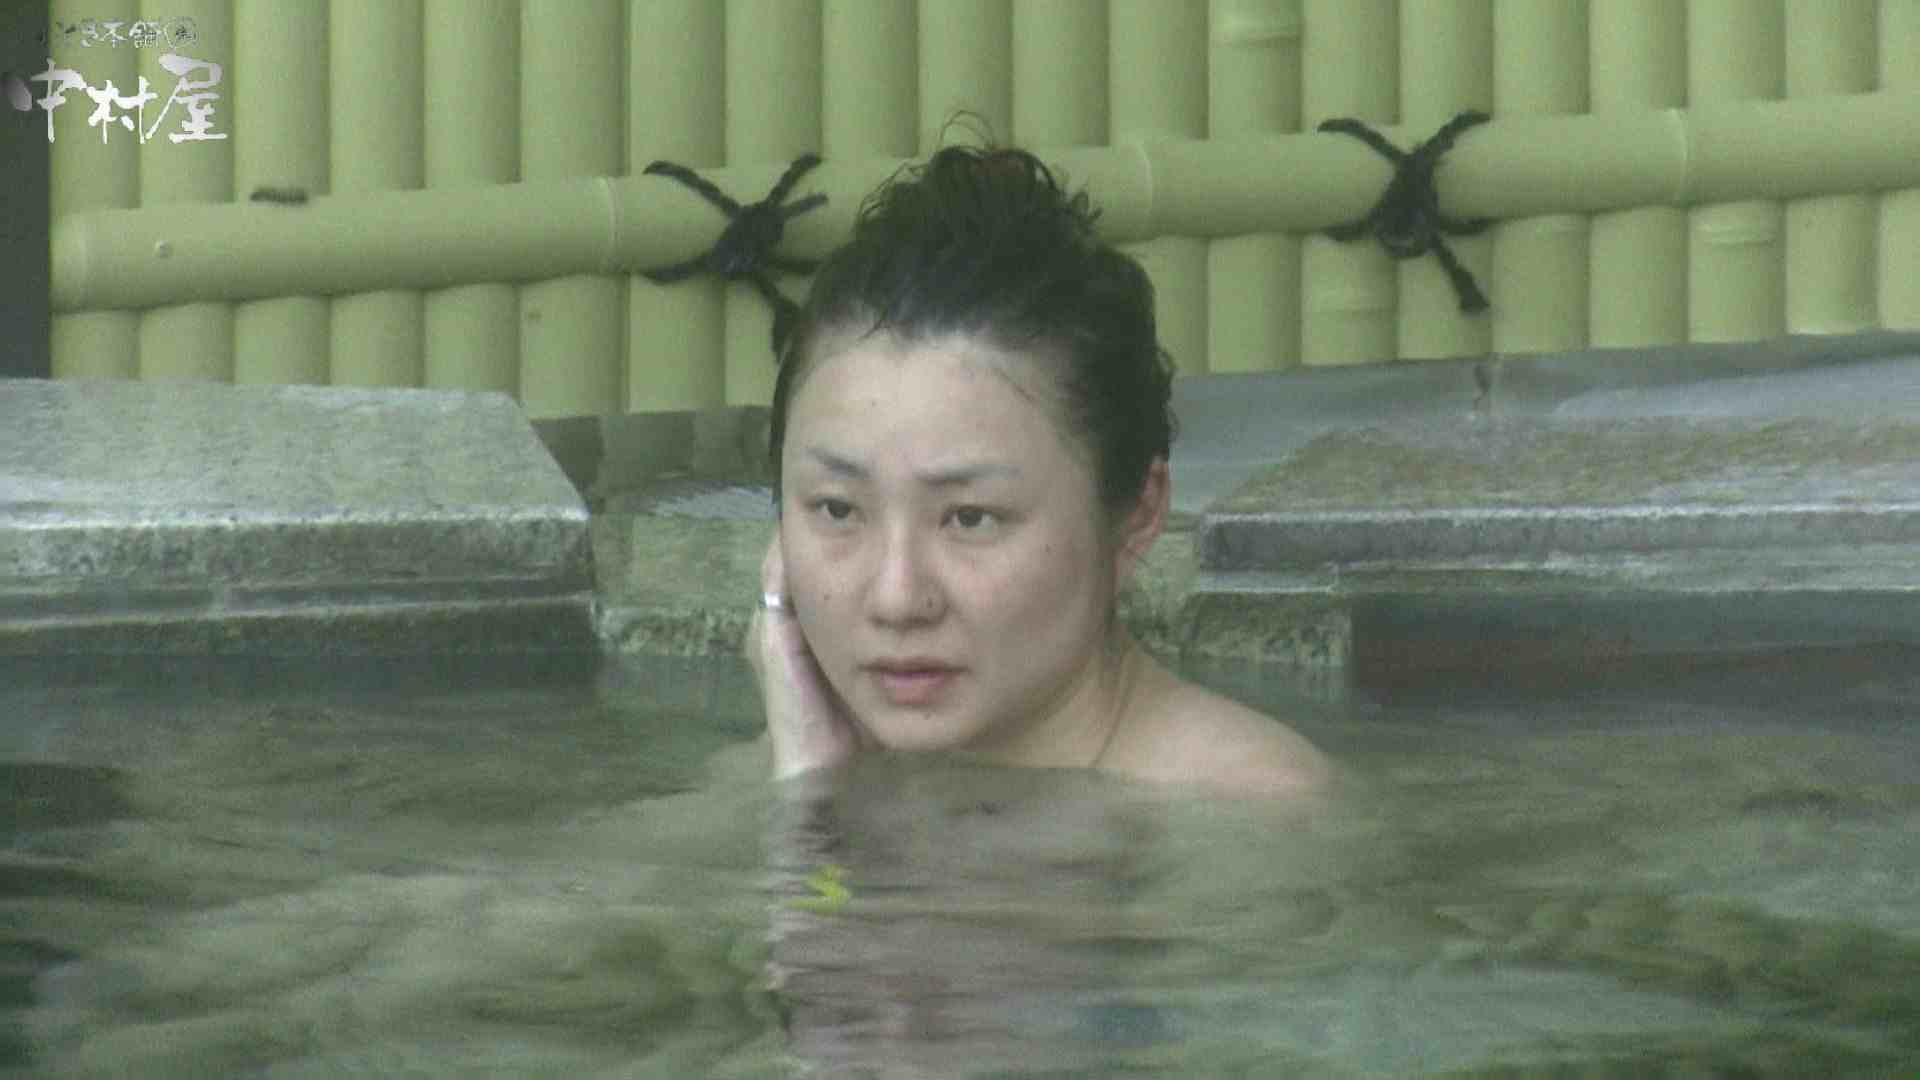 Aquaな露天風呂Vol.969 盗撮  86連発 81